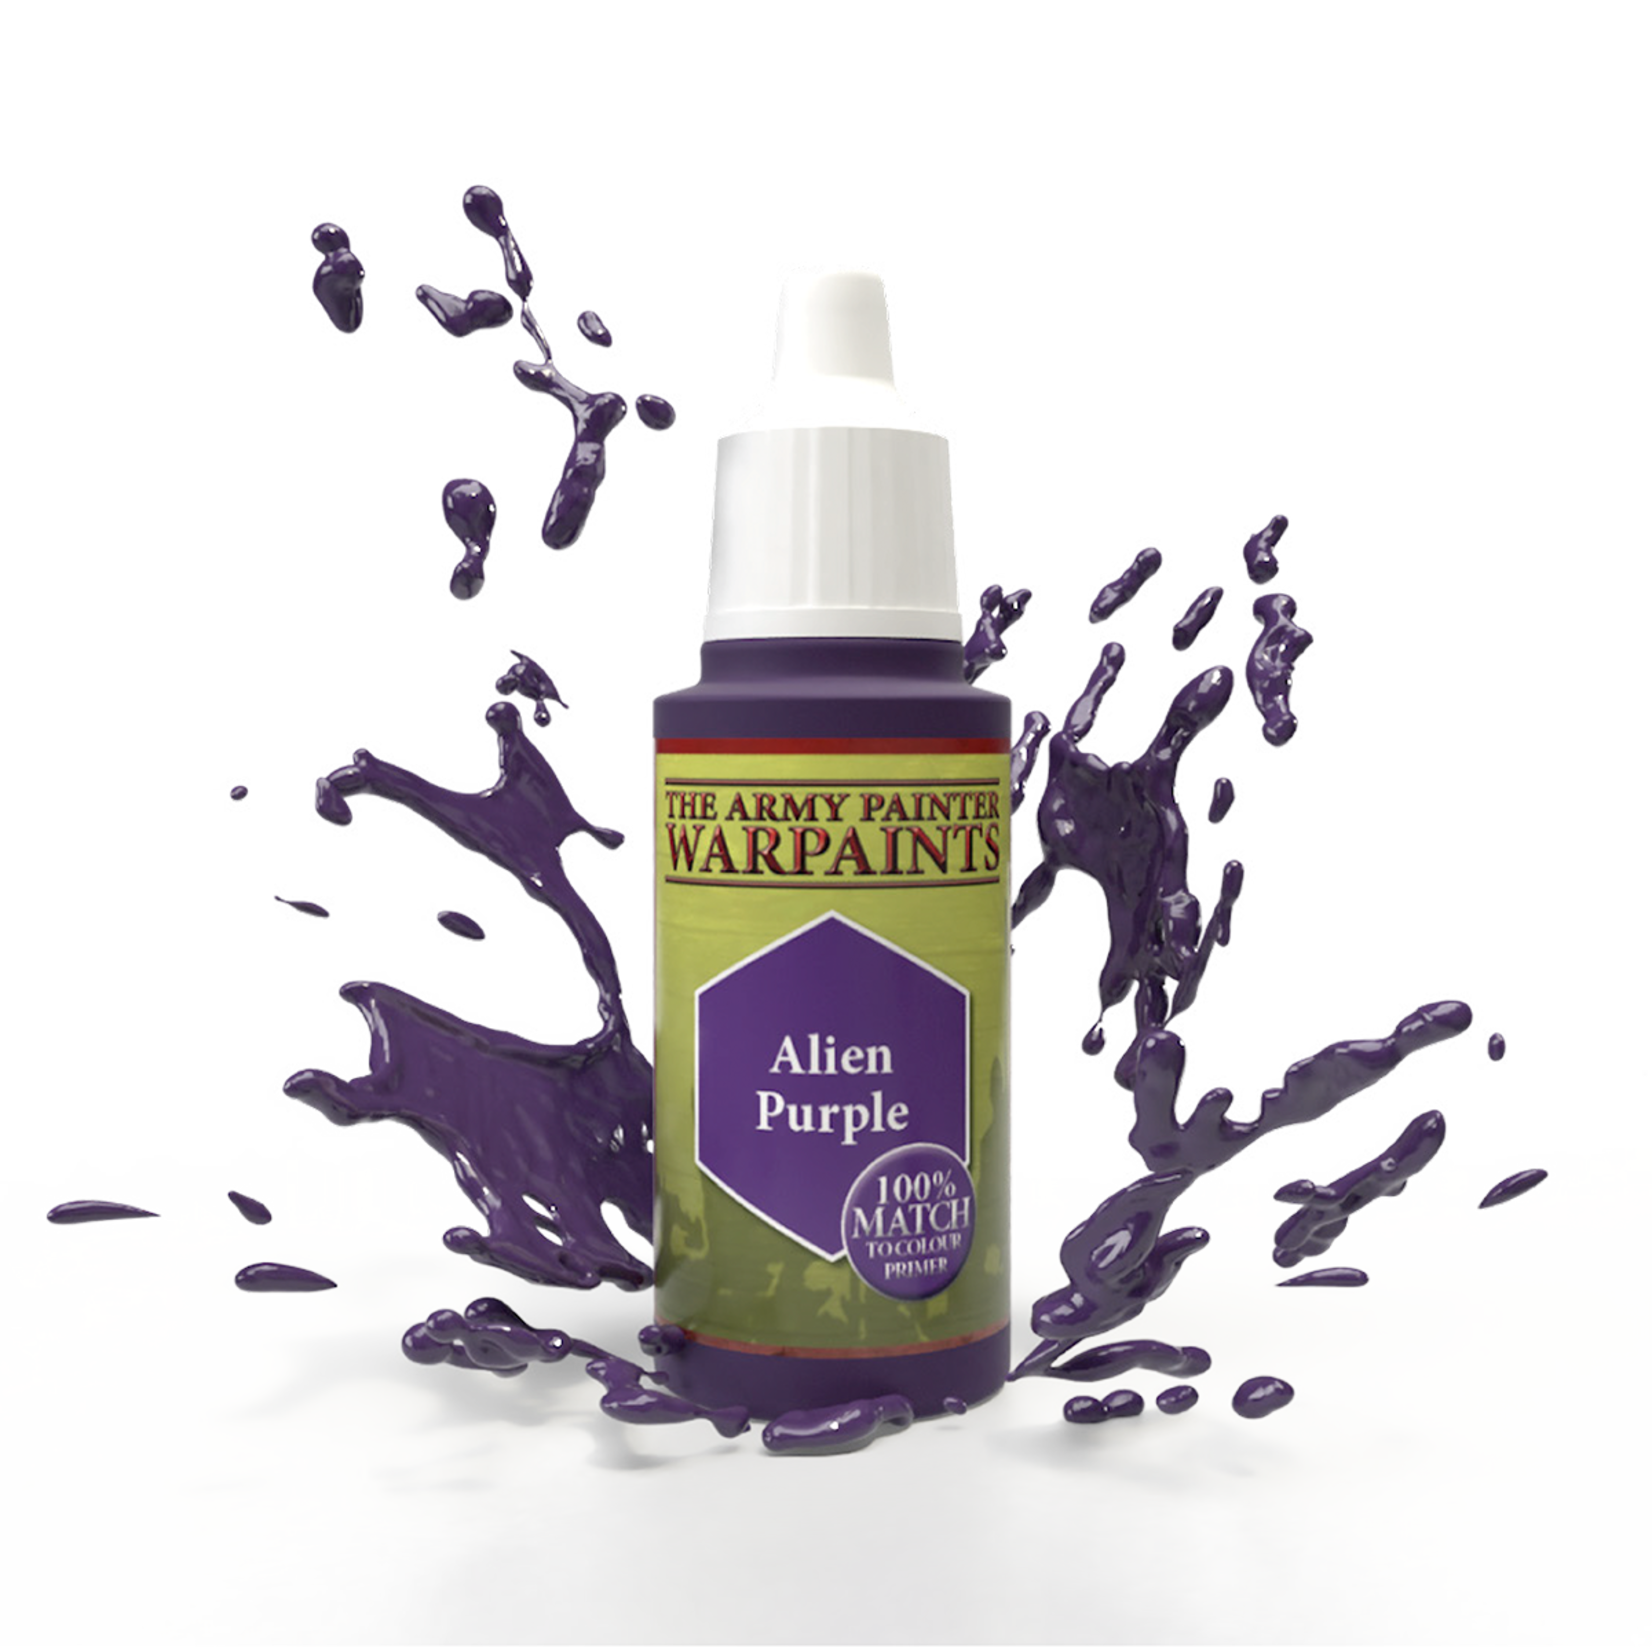 The Army Painter Warpaints: Alien Purple 18ml